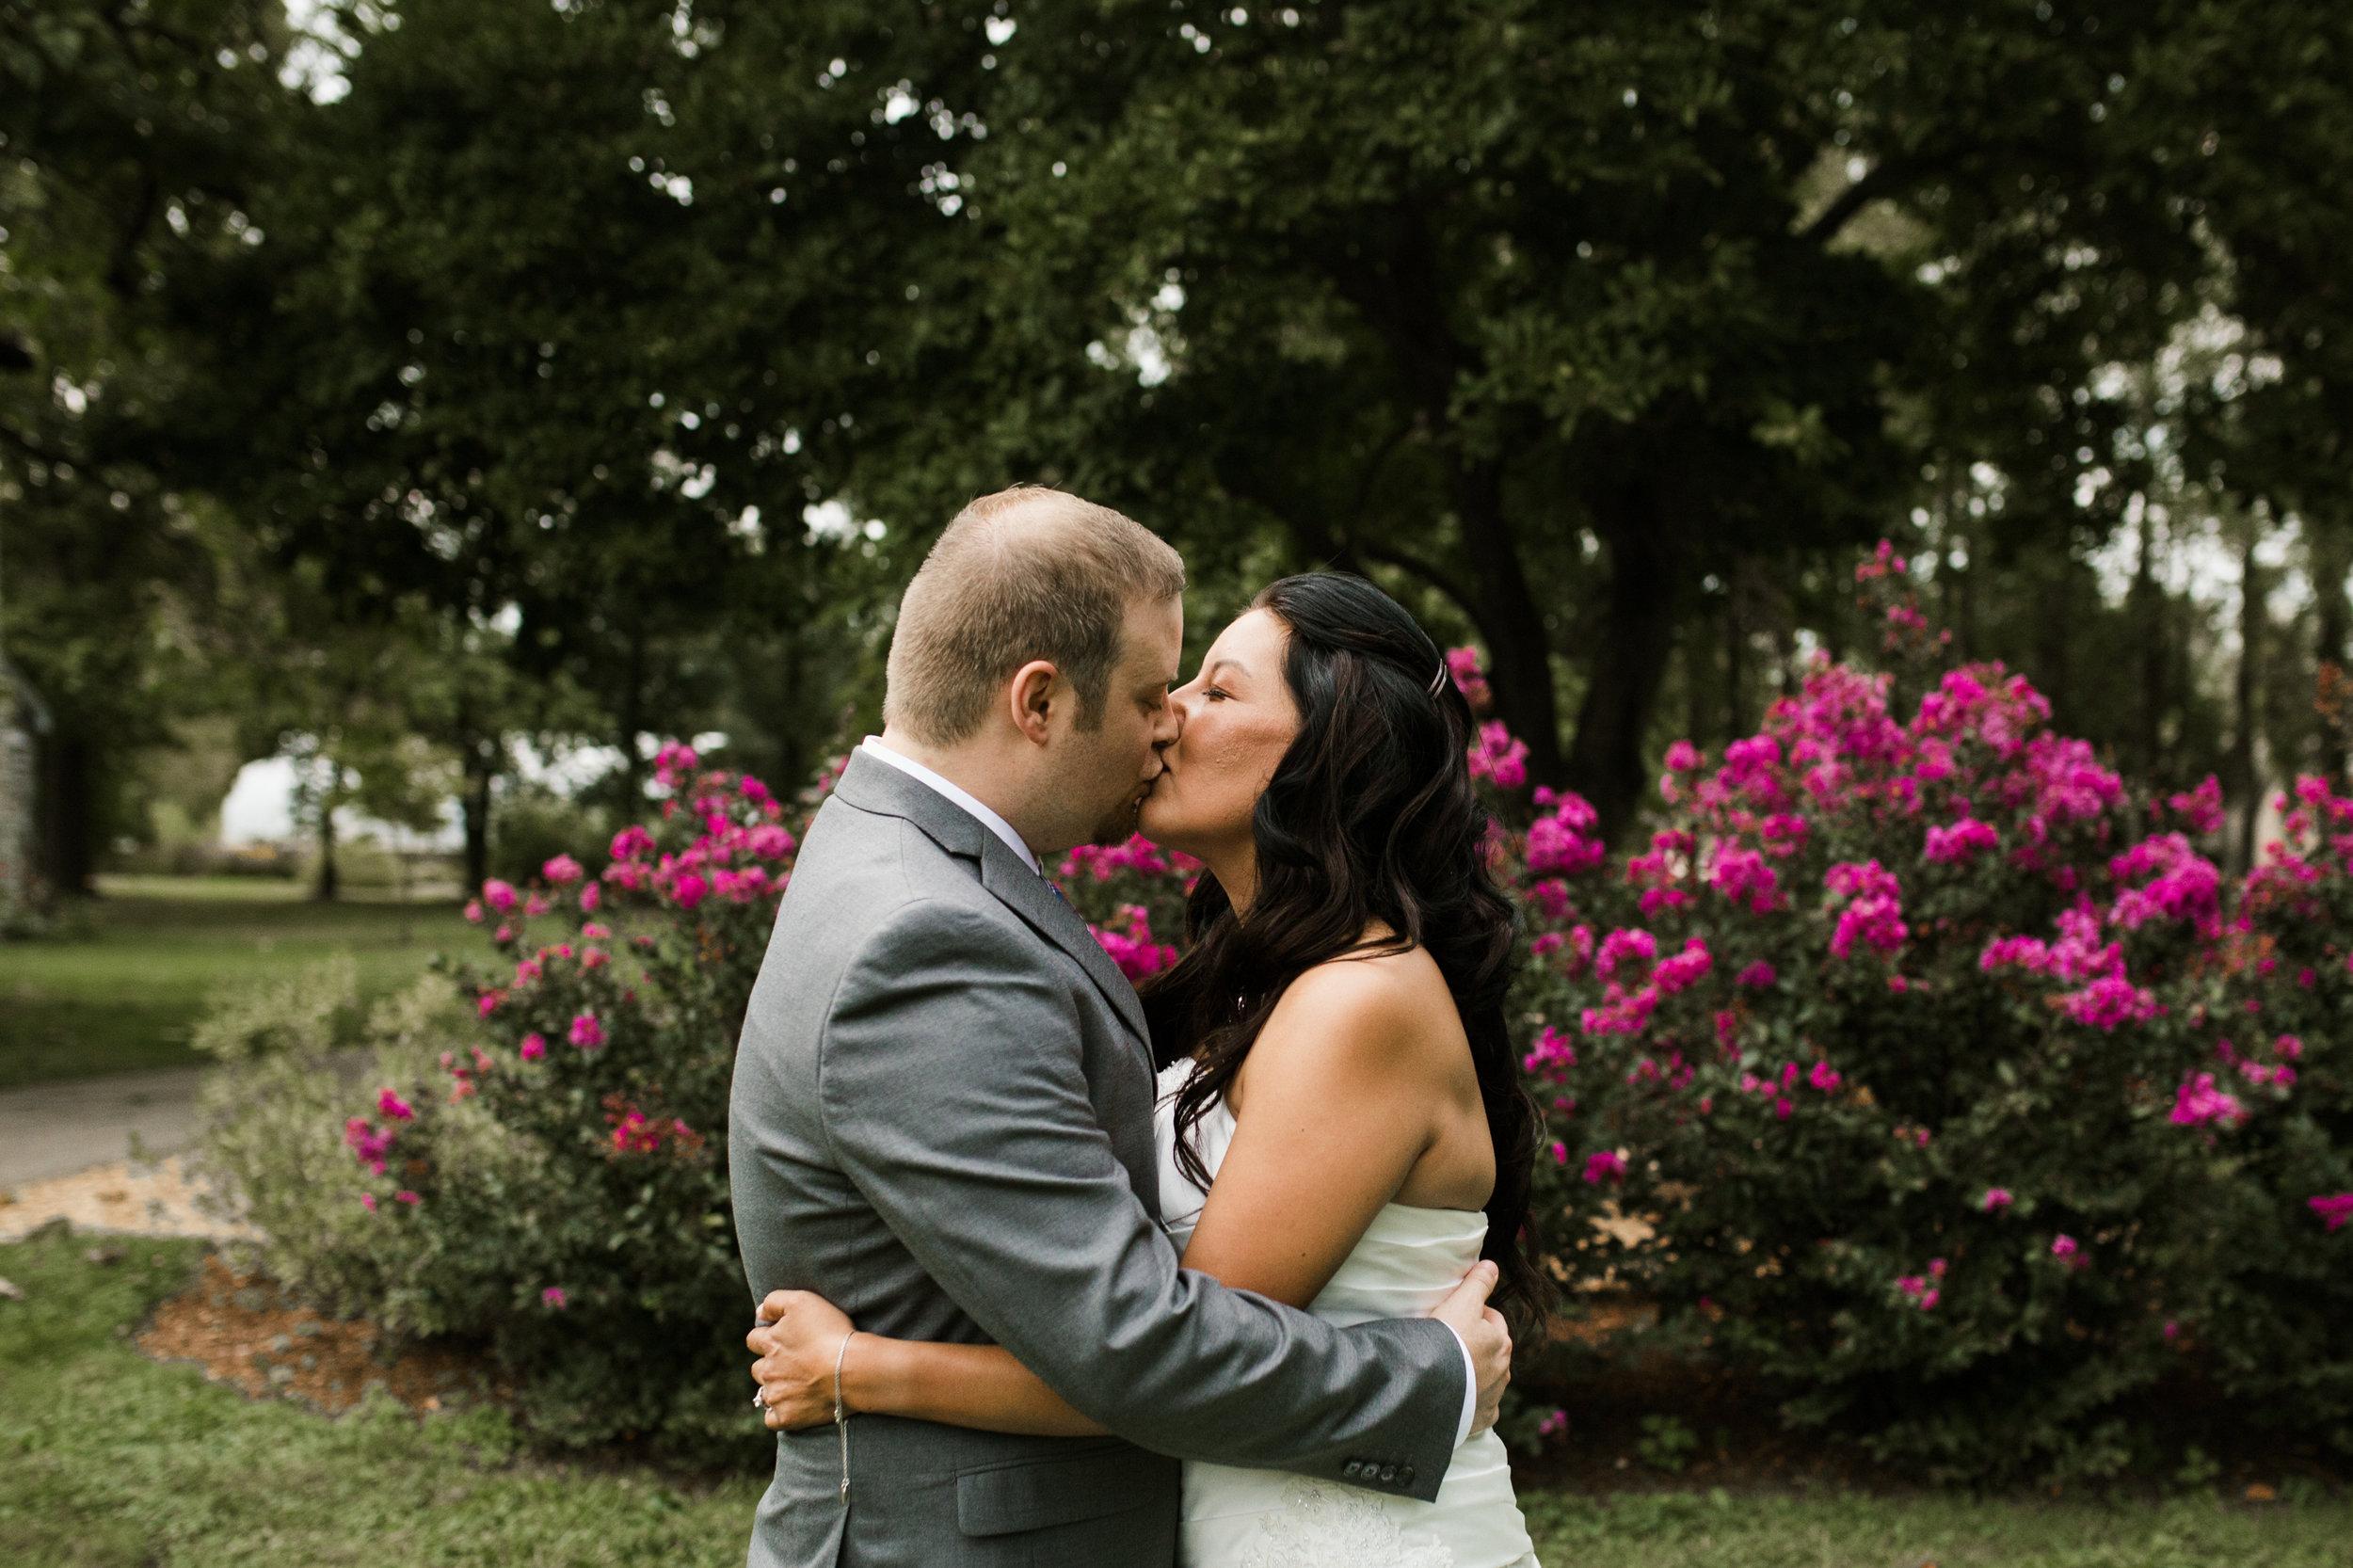 Kentucky Wedding Louisville Wedding Photographer 2018 Crystal Ludwick Photo Louisville Wedding Photographer Kentucky Wedding Photographer (63 of 76).jpg